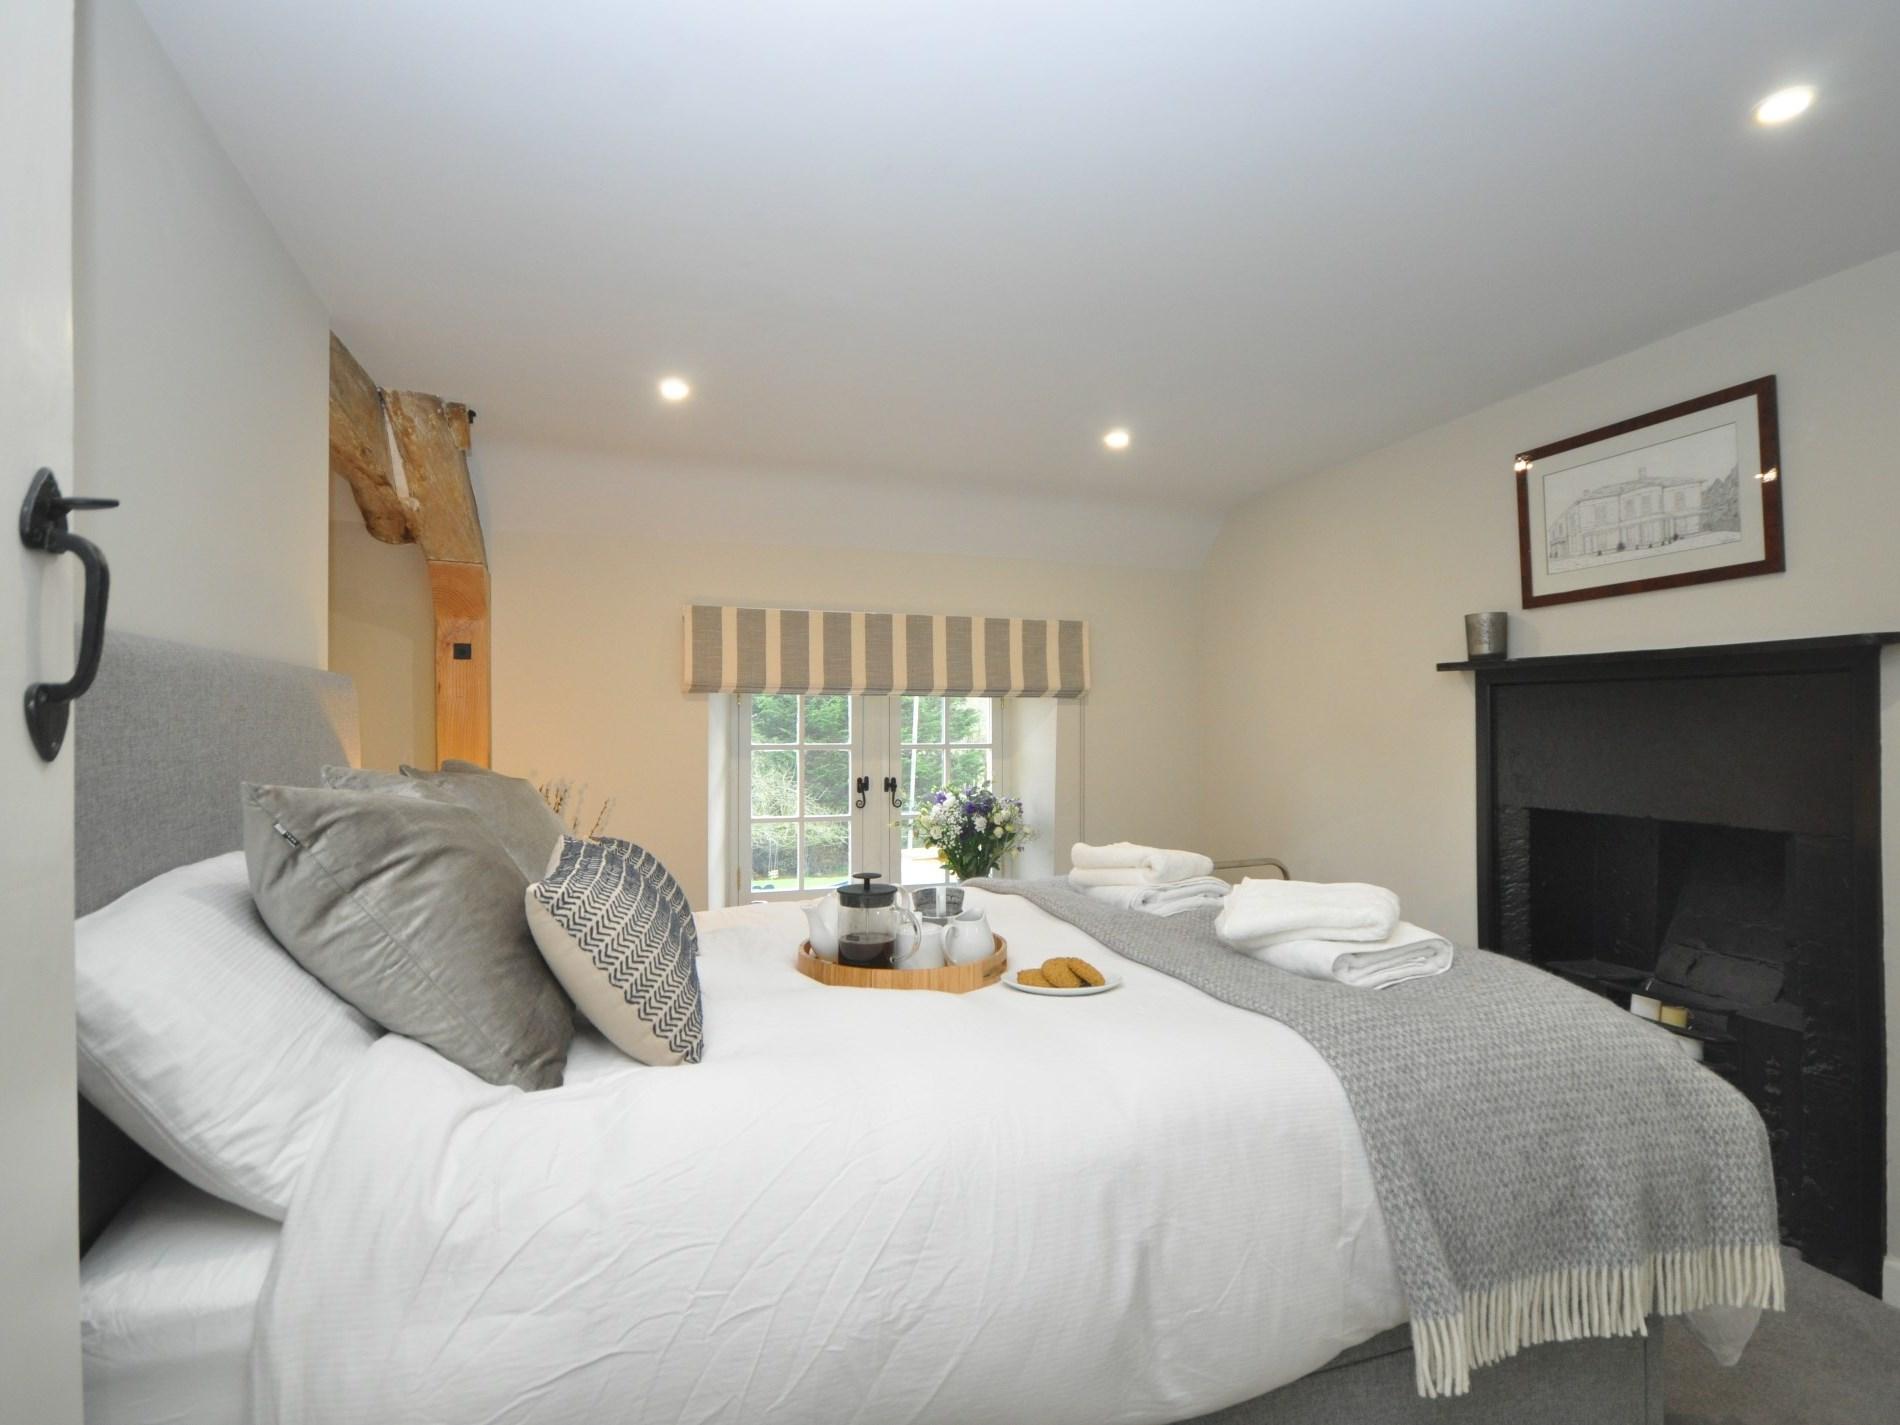 Enjoy a peaceful nights sleep in this stylish double room